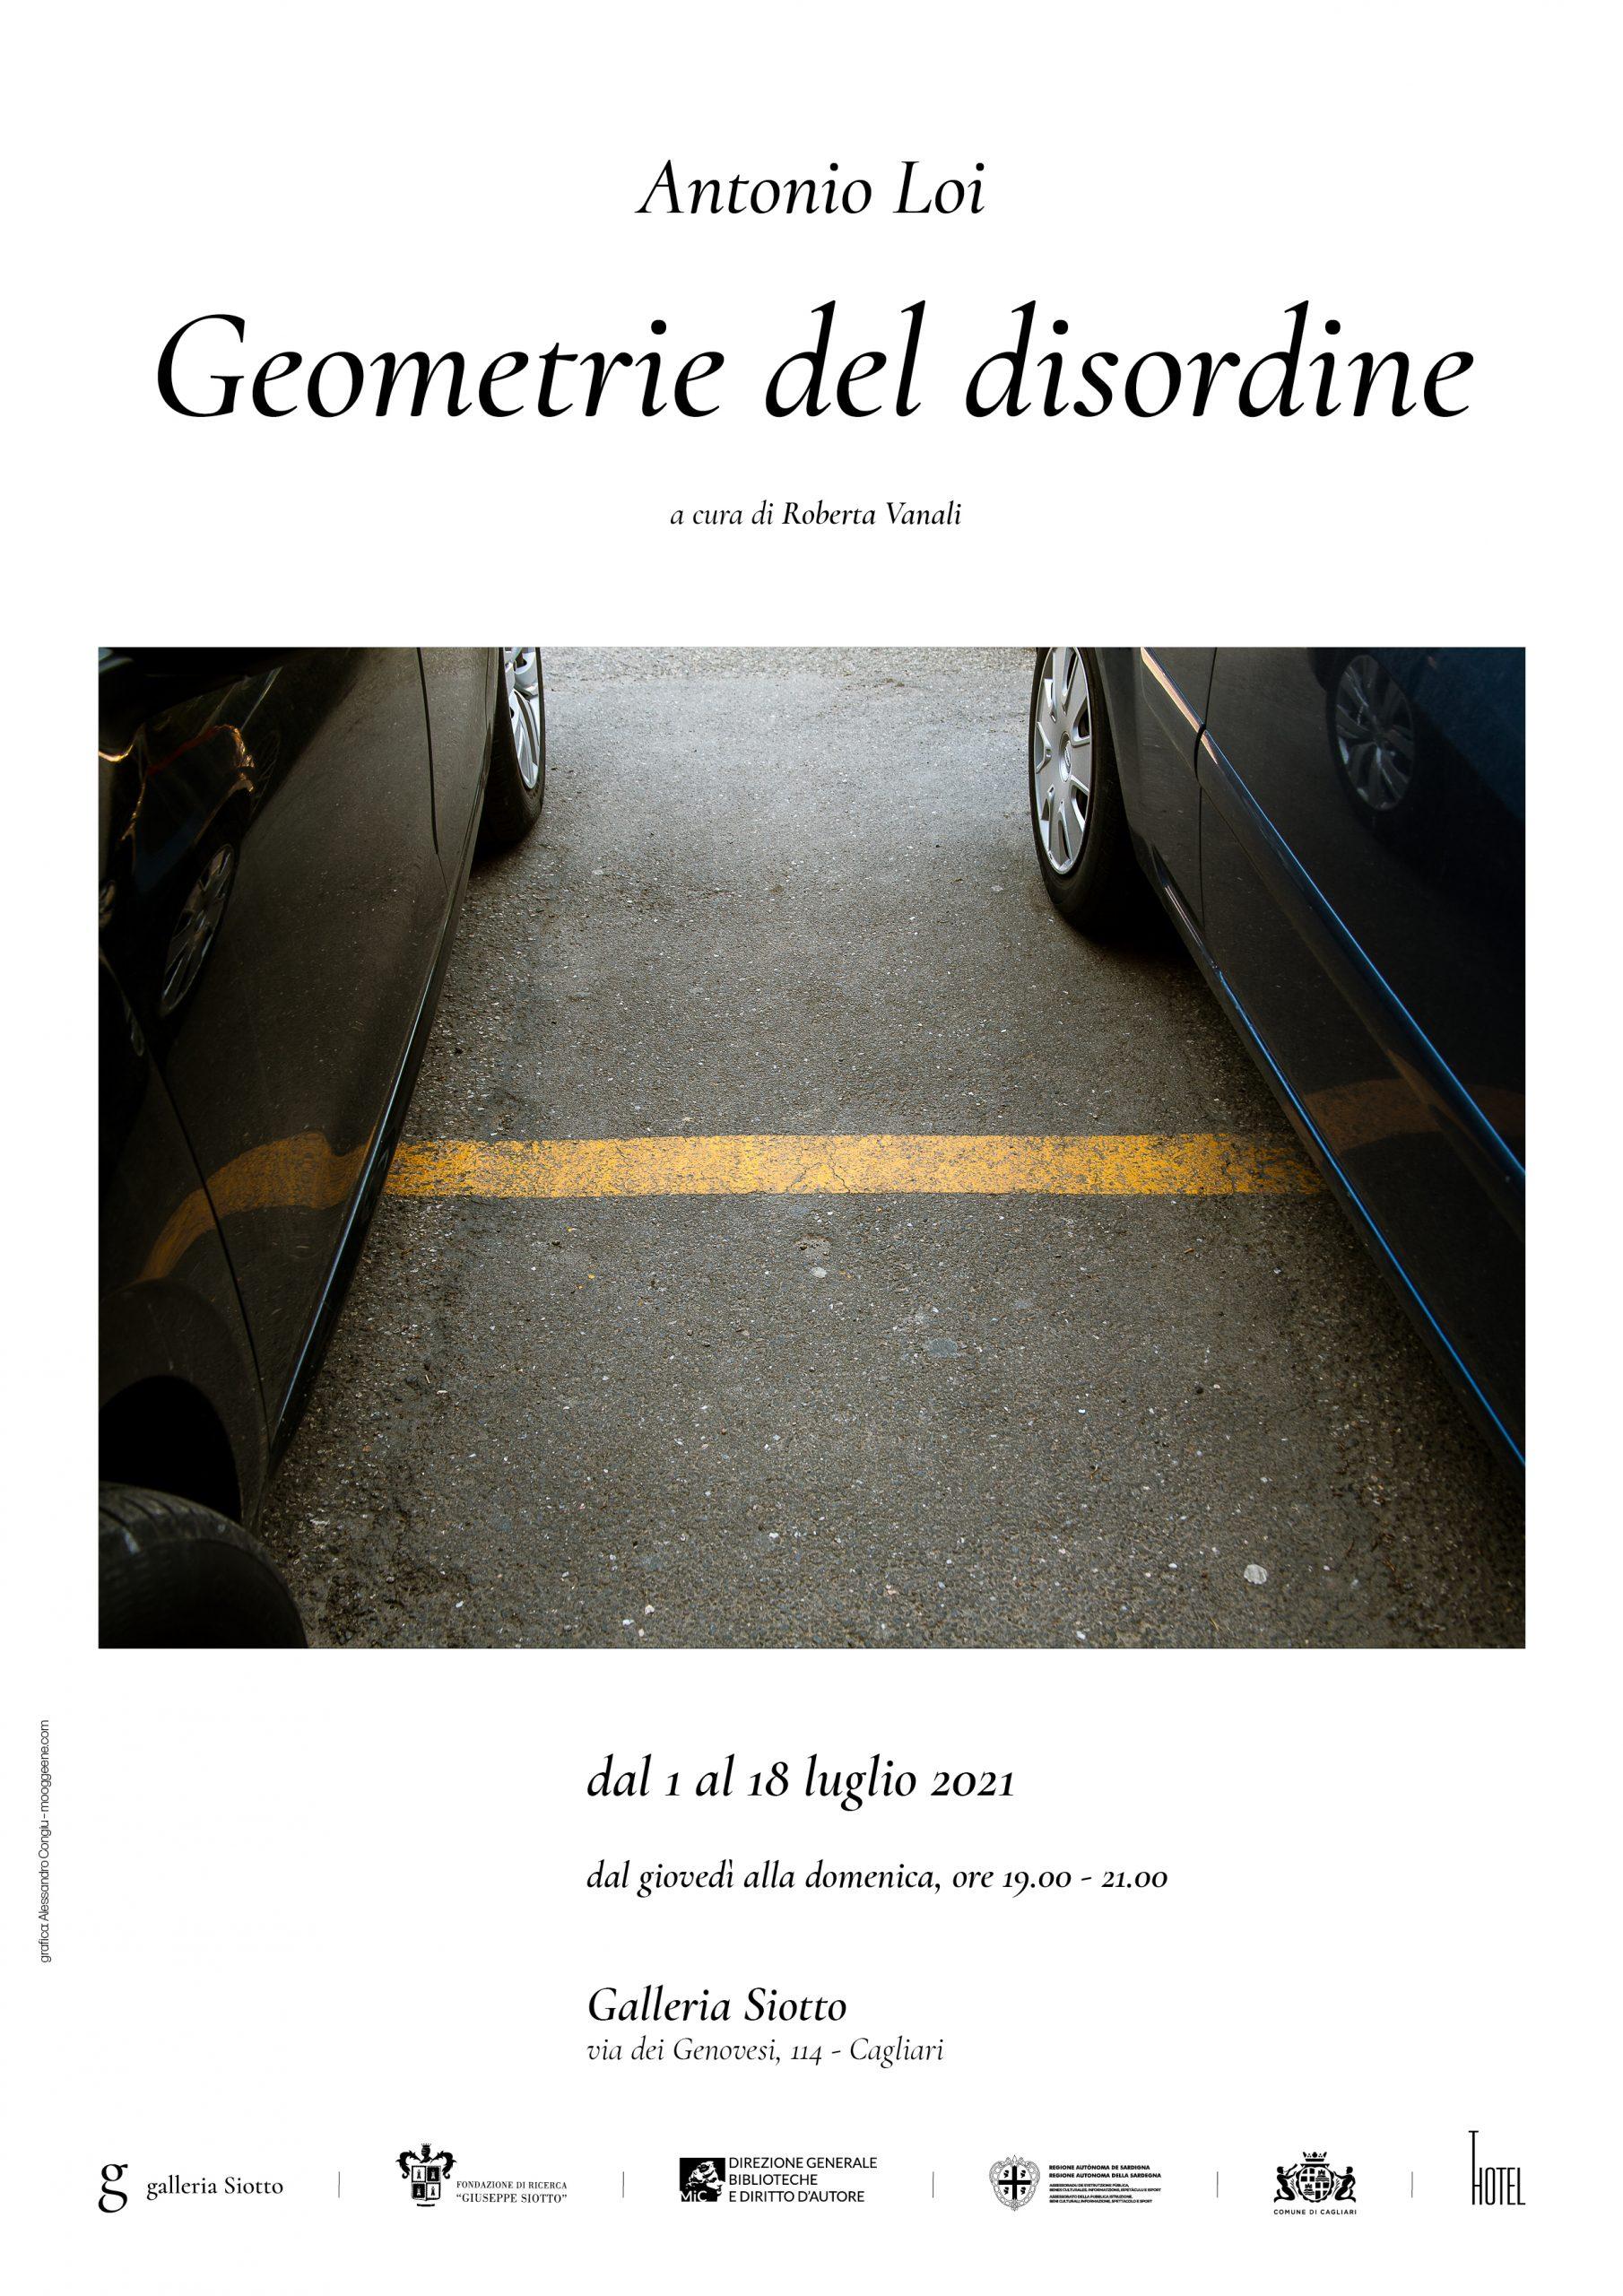 Geometrie del disordine – Antonio Loi